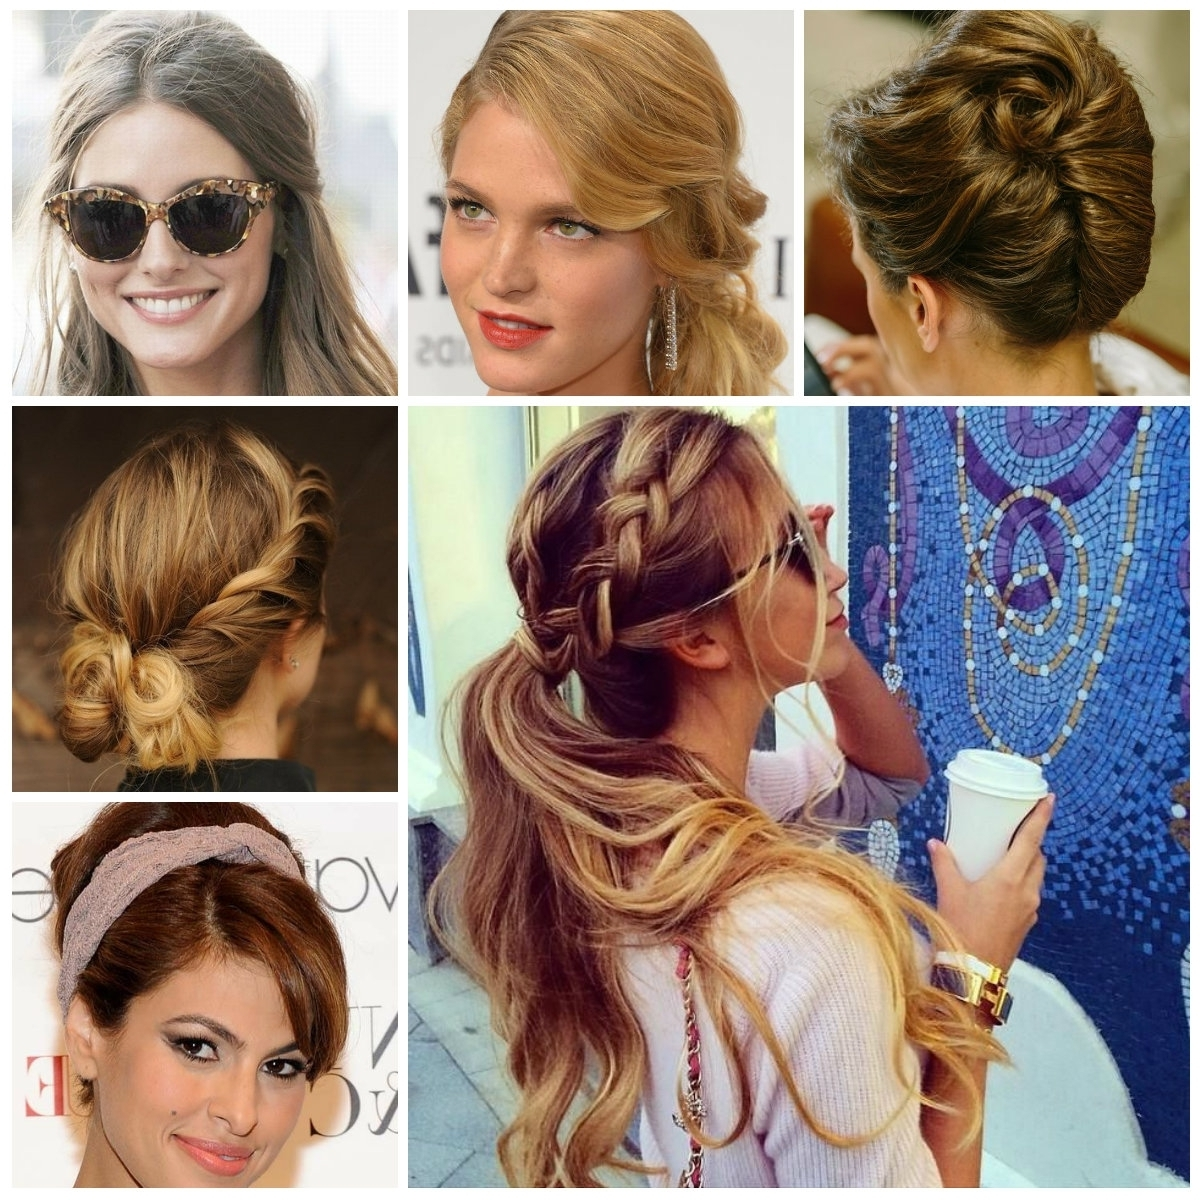 Easy Casual Updo Hairstyles For Long Hair – Women Medium Haircut Regarding Long Hair Easy Updo Hairstyles (View 9 of 15)